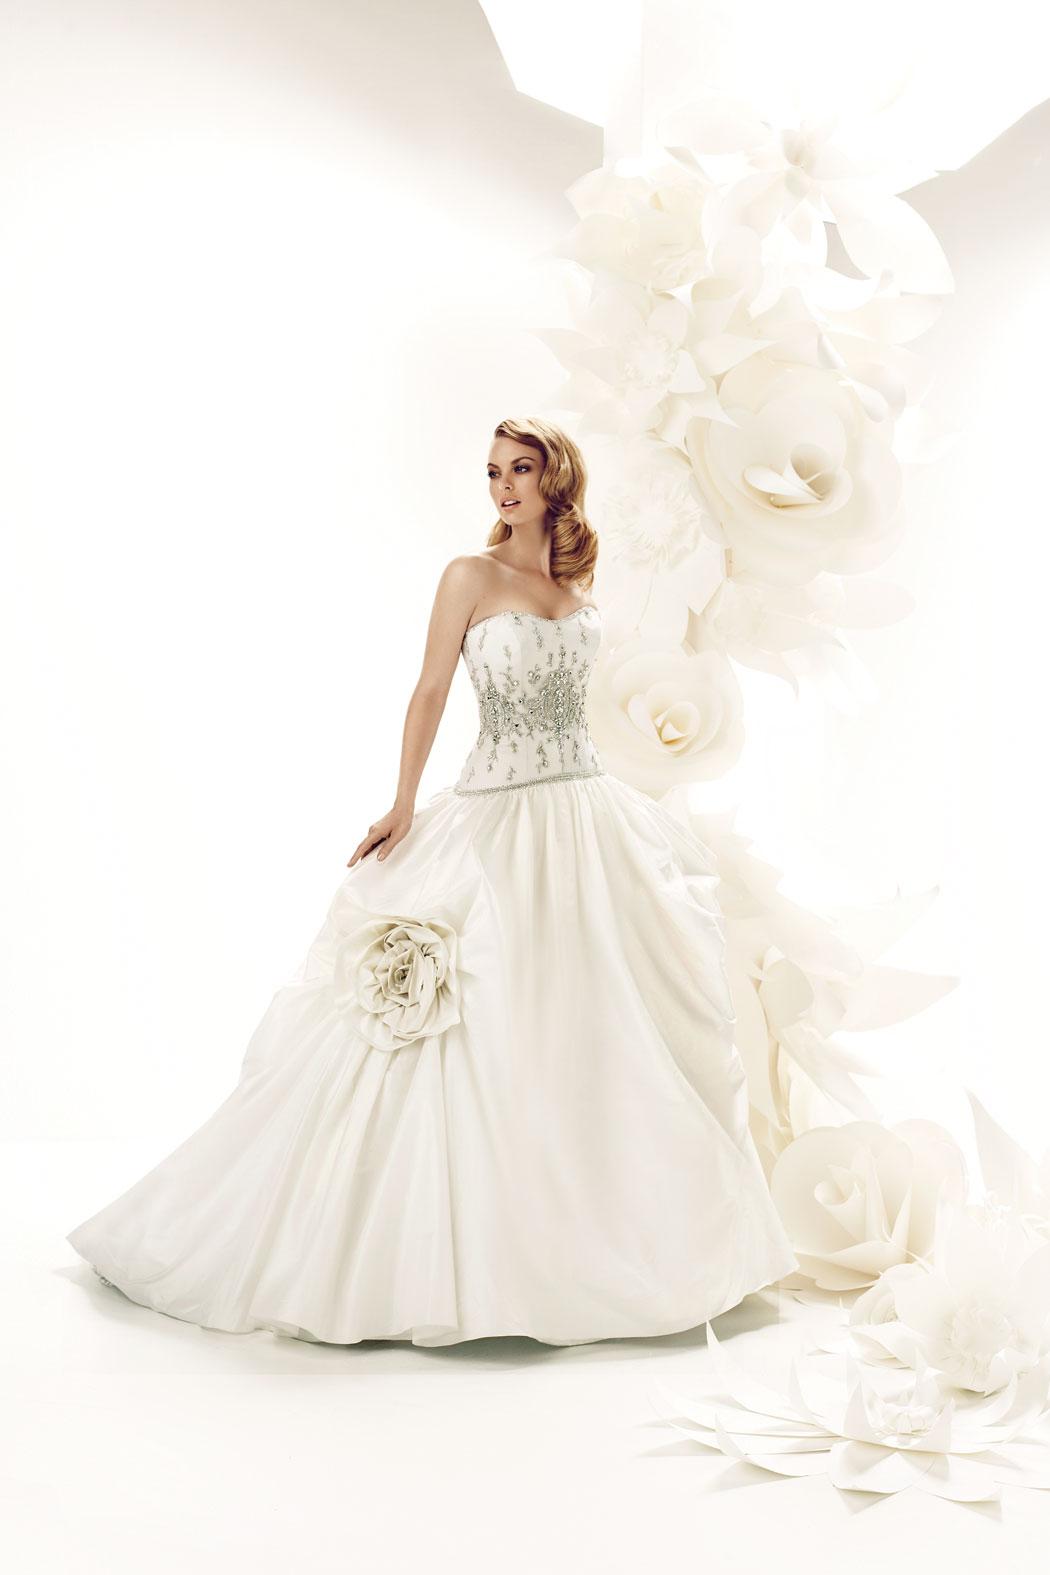 posh wedding dresses photo - 1